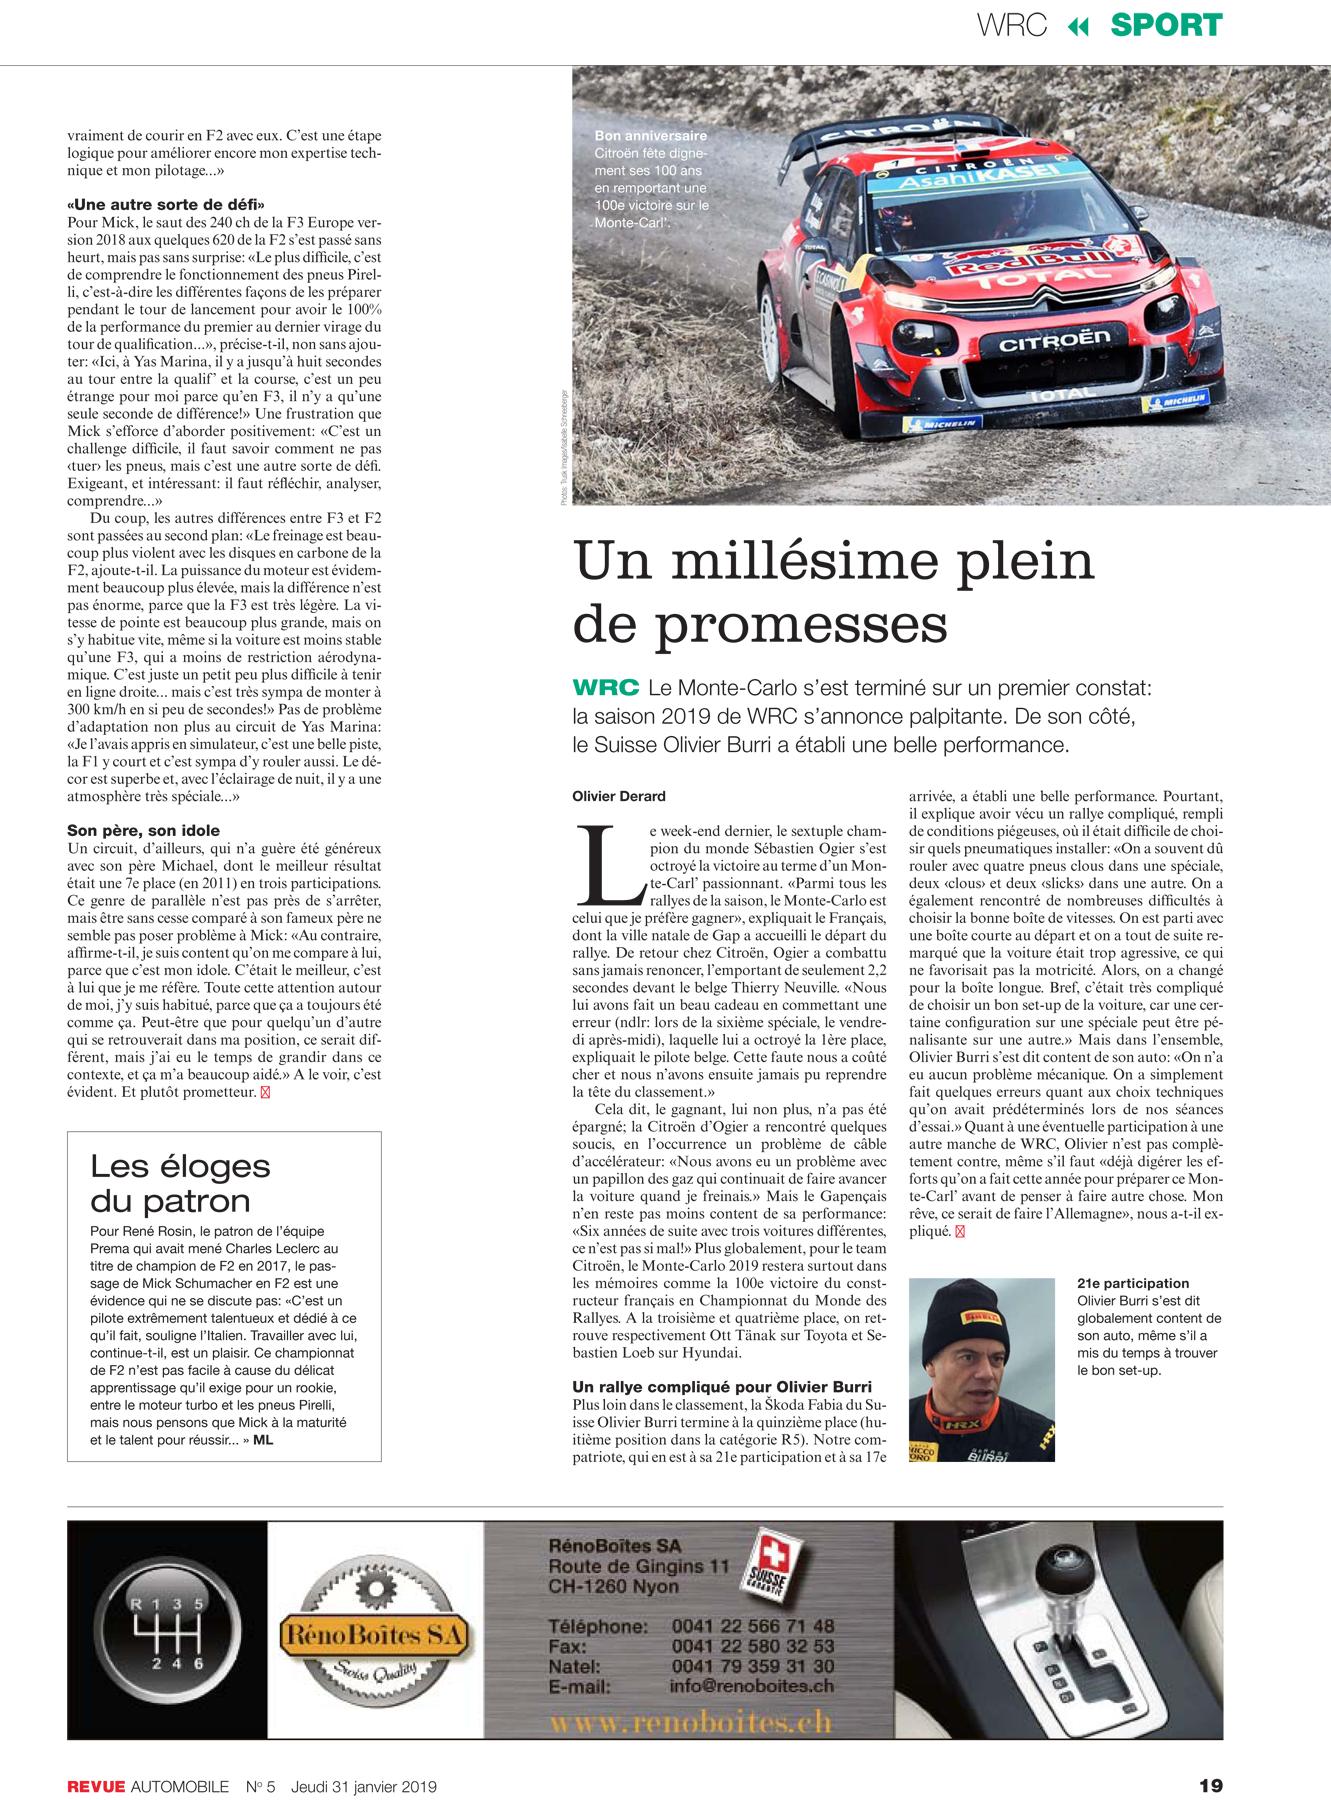 Revue Automobile N° 5/2019